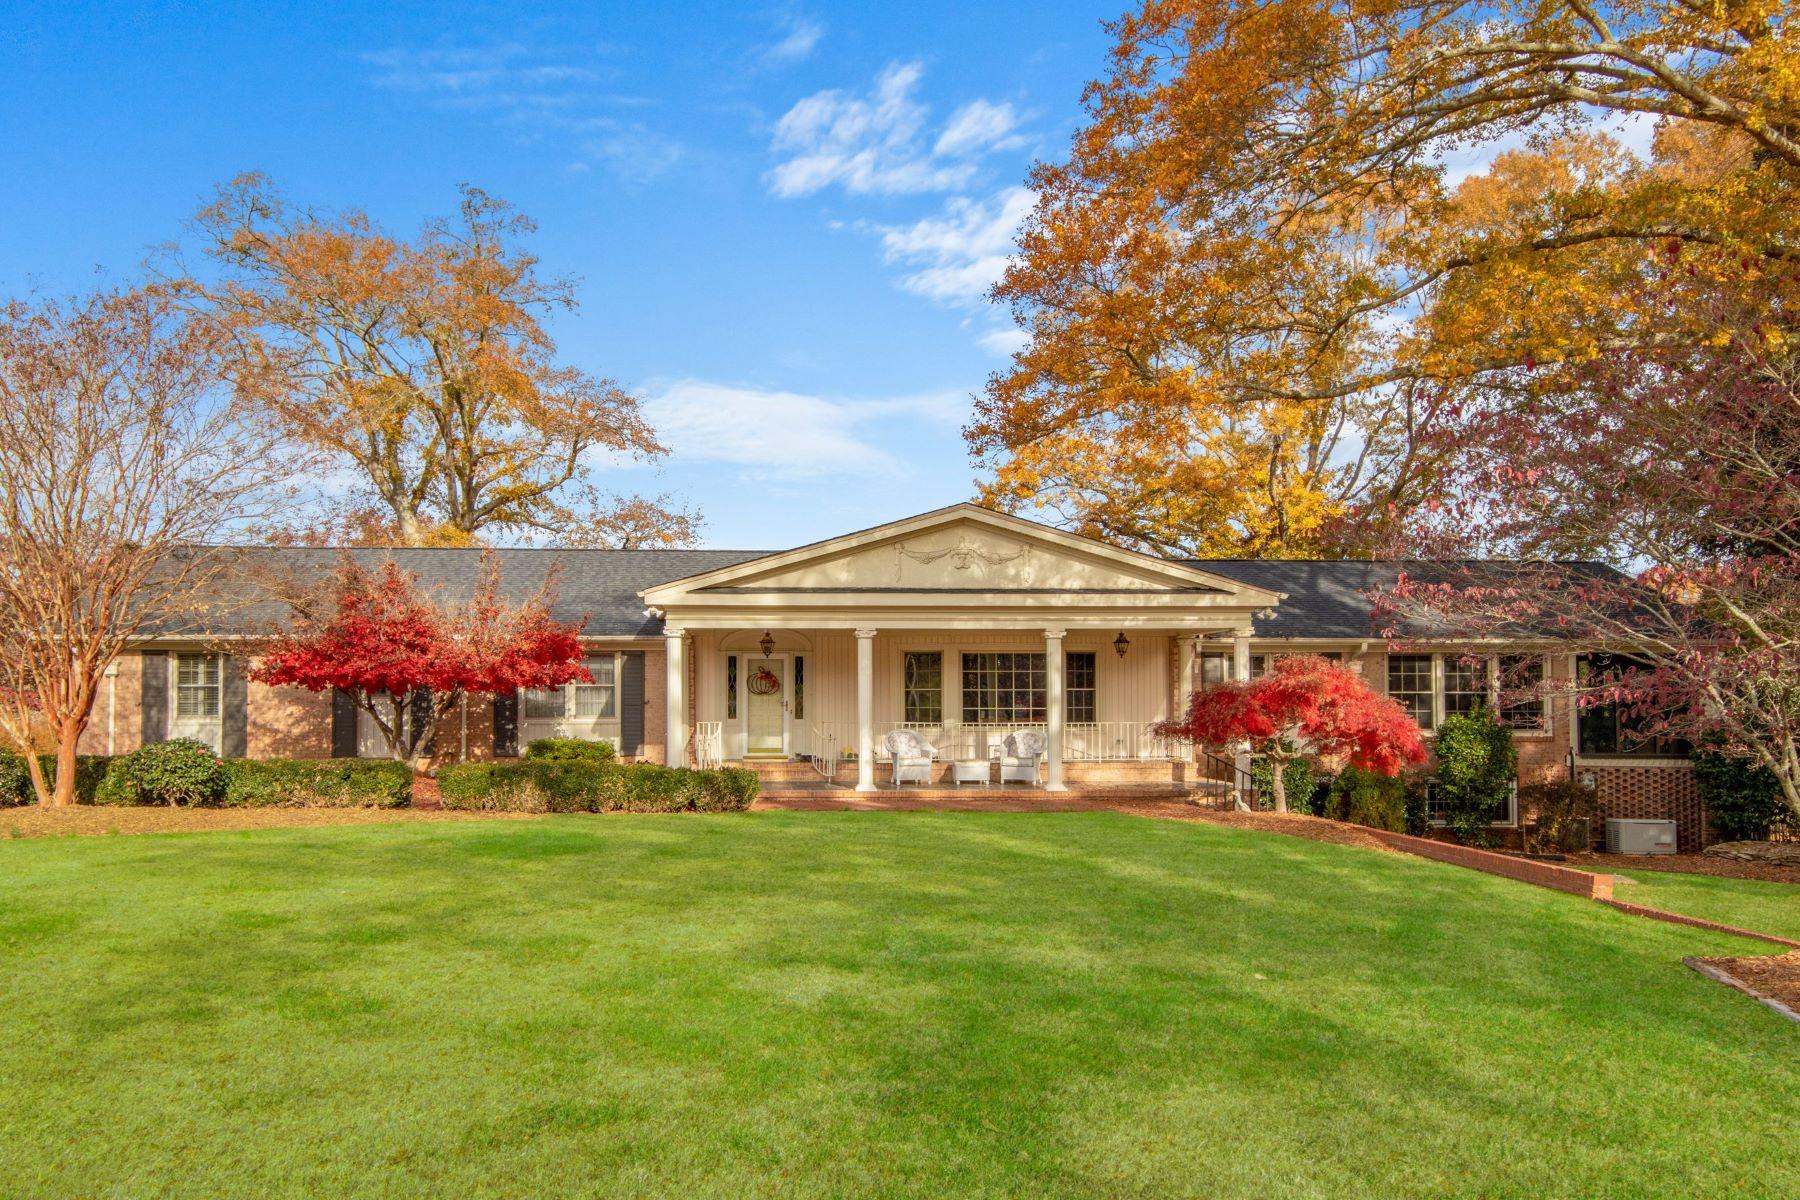 Single Family Homes 为 销售 在 500 Taylor Road, Greenville, SC 29607 500 Taylor Road 格林维尔, 南卡罗来纳 29607 美国